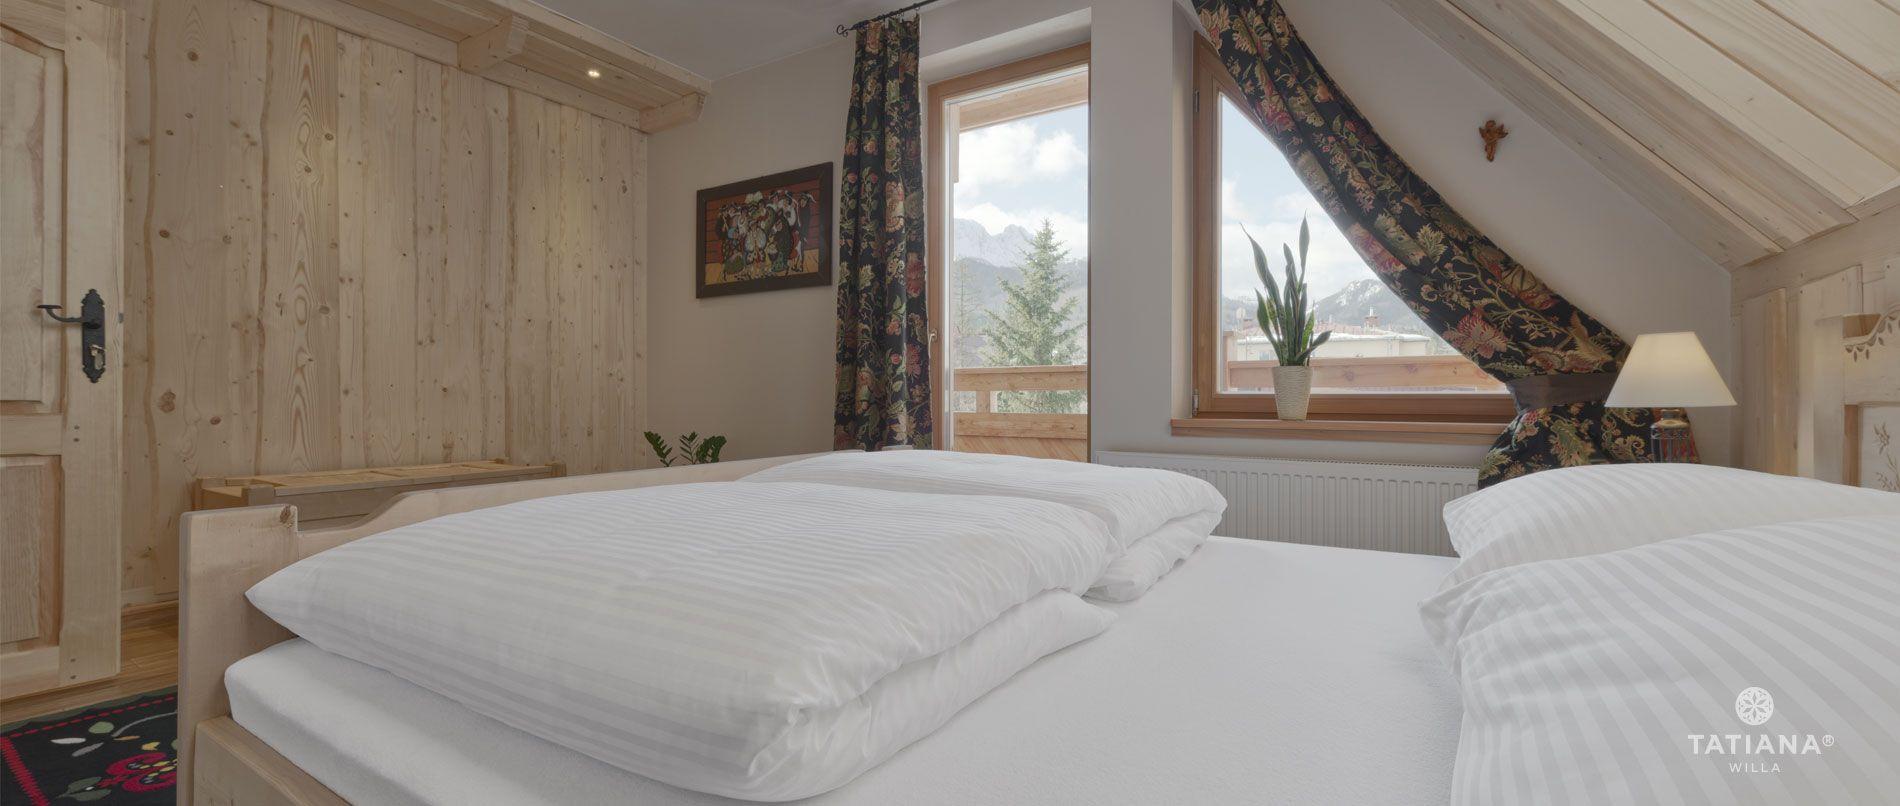 Apartment 16 - Bedroom